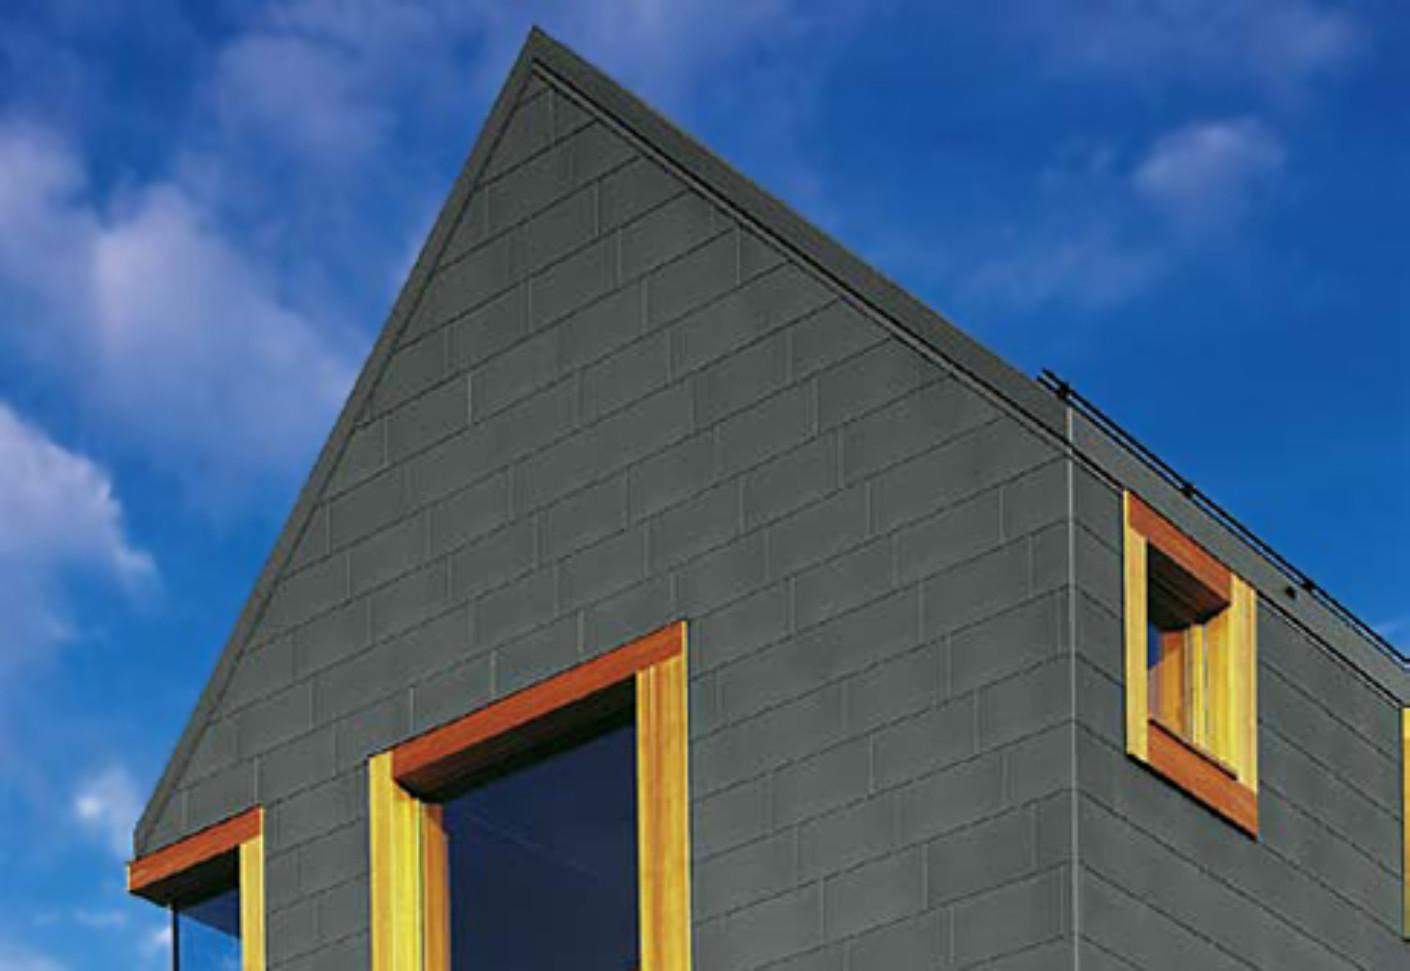 Tile Systems Pre Weathered Pro Graphite Grey By Rheinzink